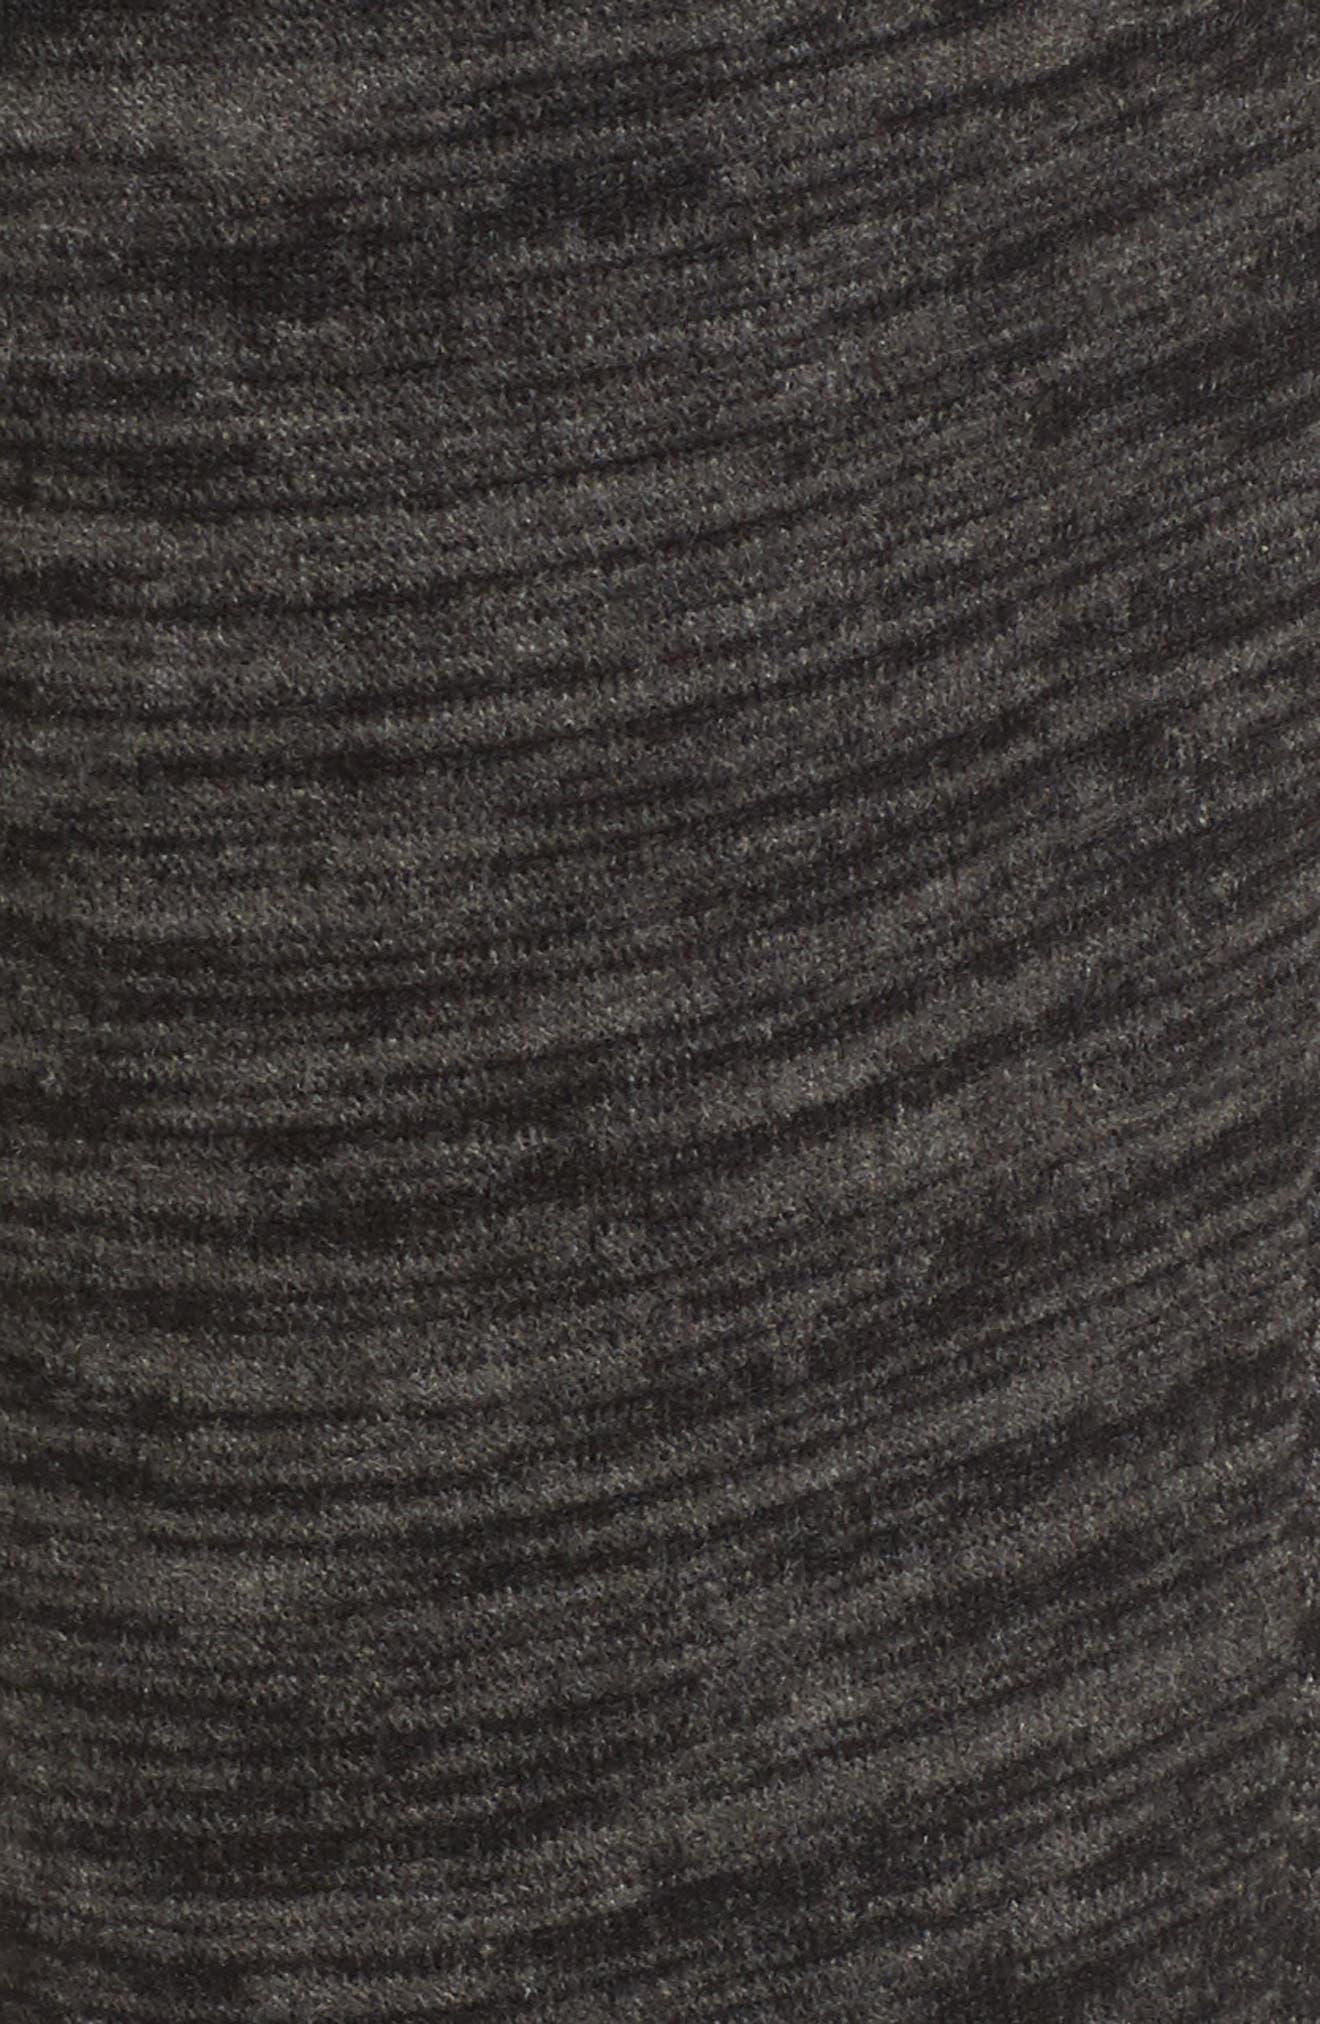 Cozy Jogger Pants,                             Alternate thumbnail 5, color,                             Black